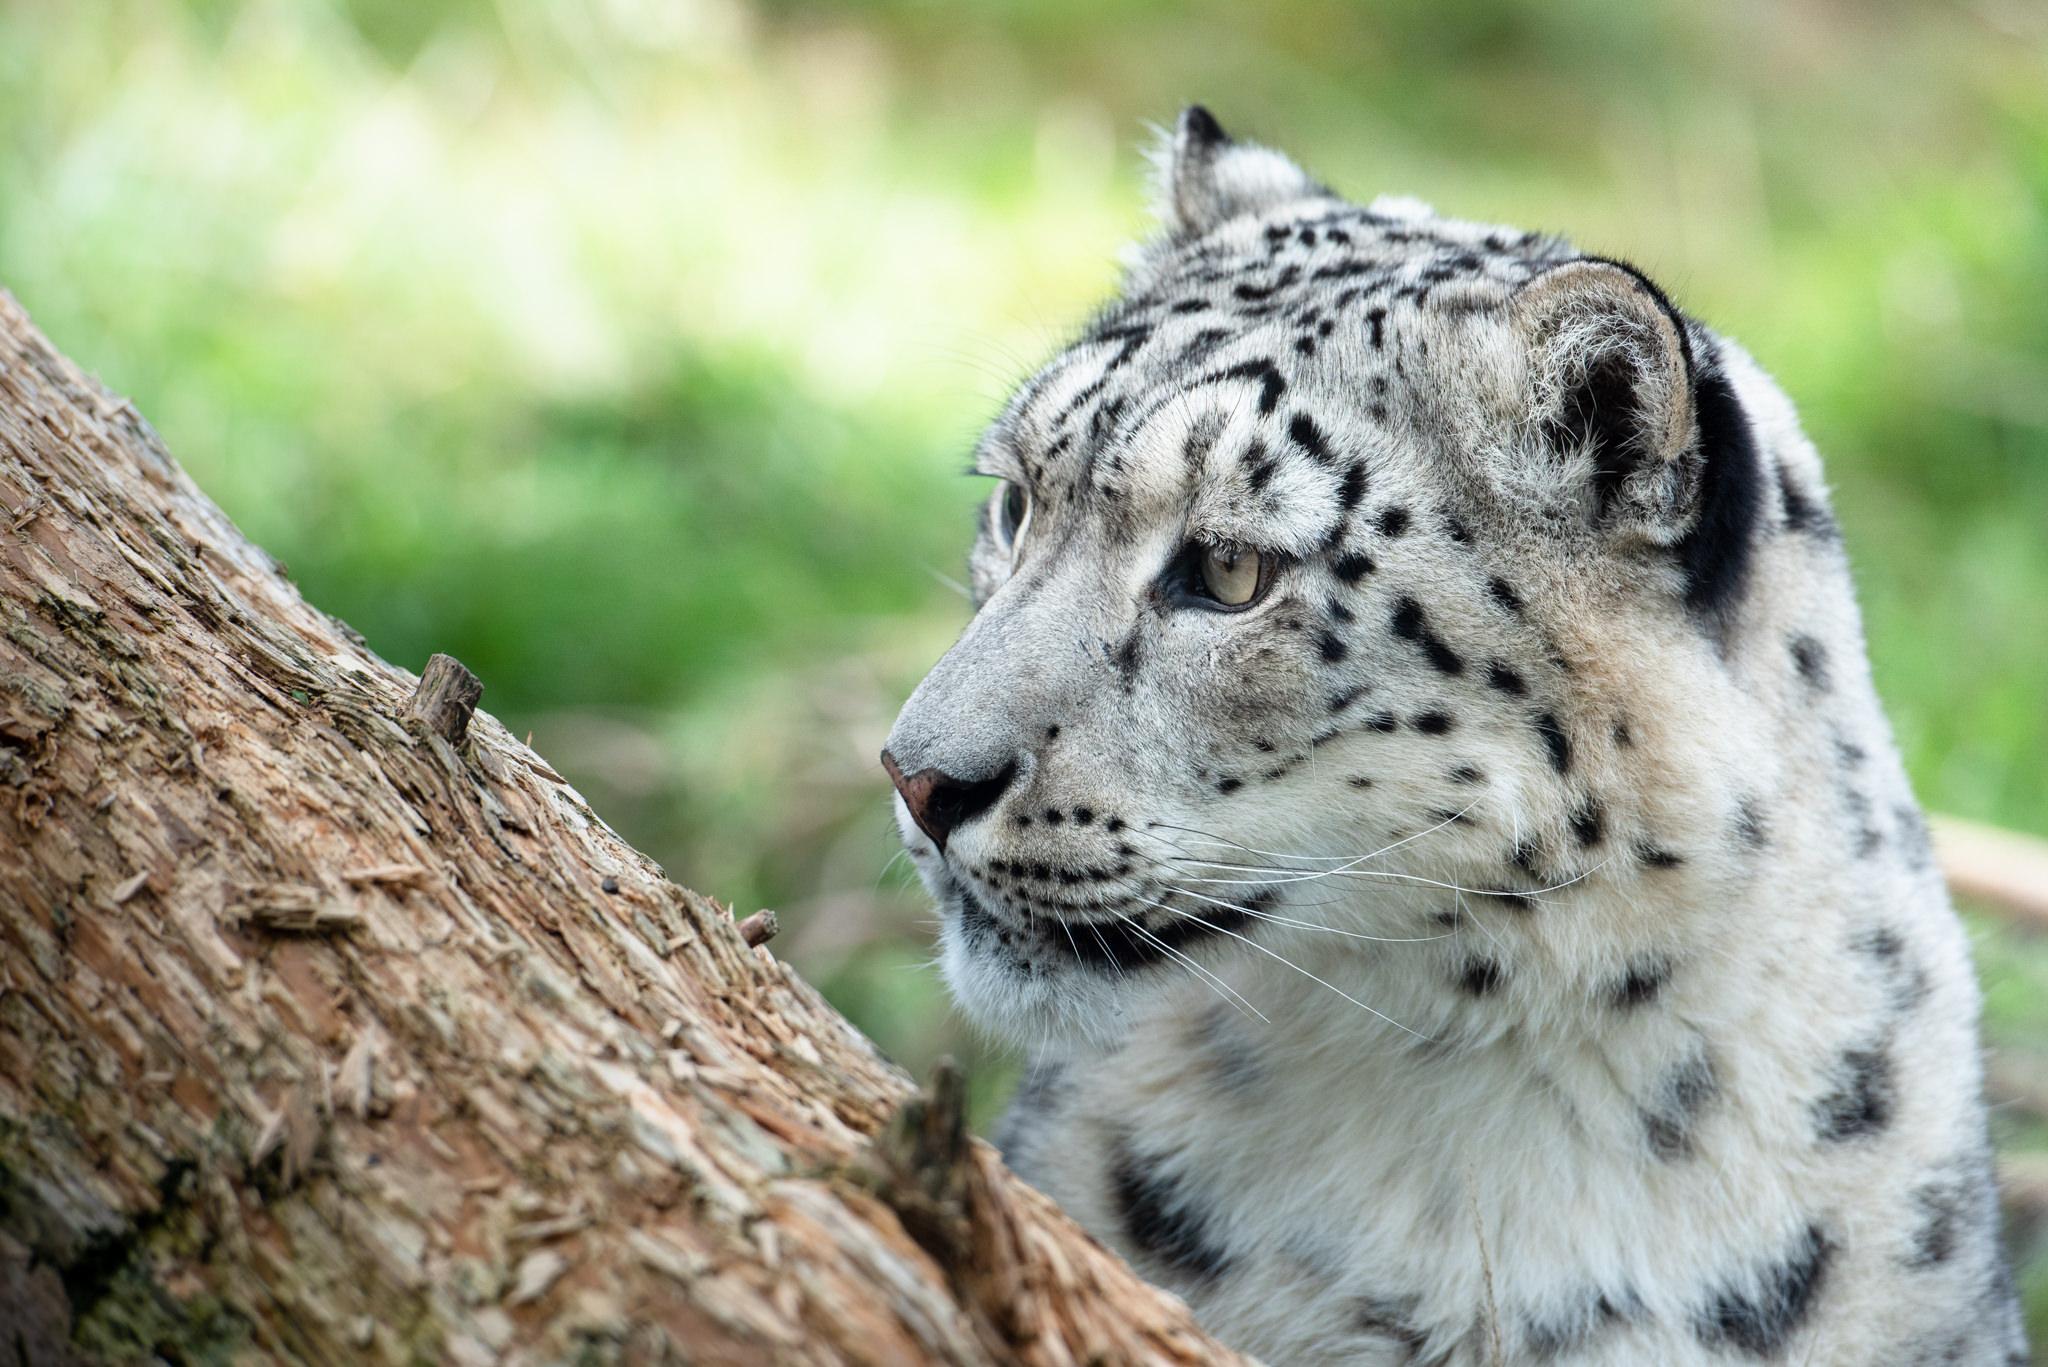 highland-wildlife-park-snow-leopard.jpg